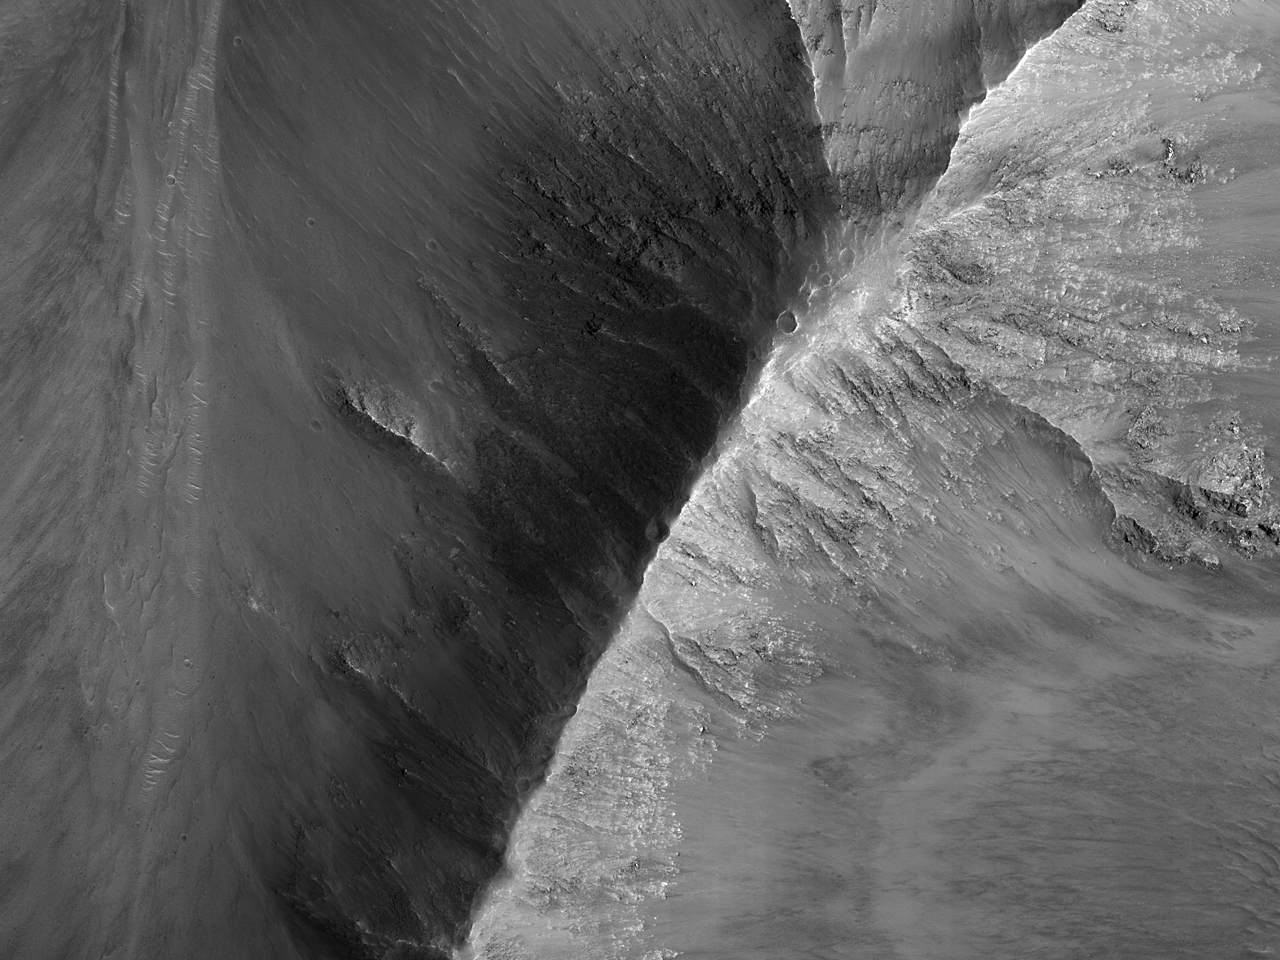 Склоны горного хребта в каньоне Coprates Chasma